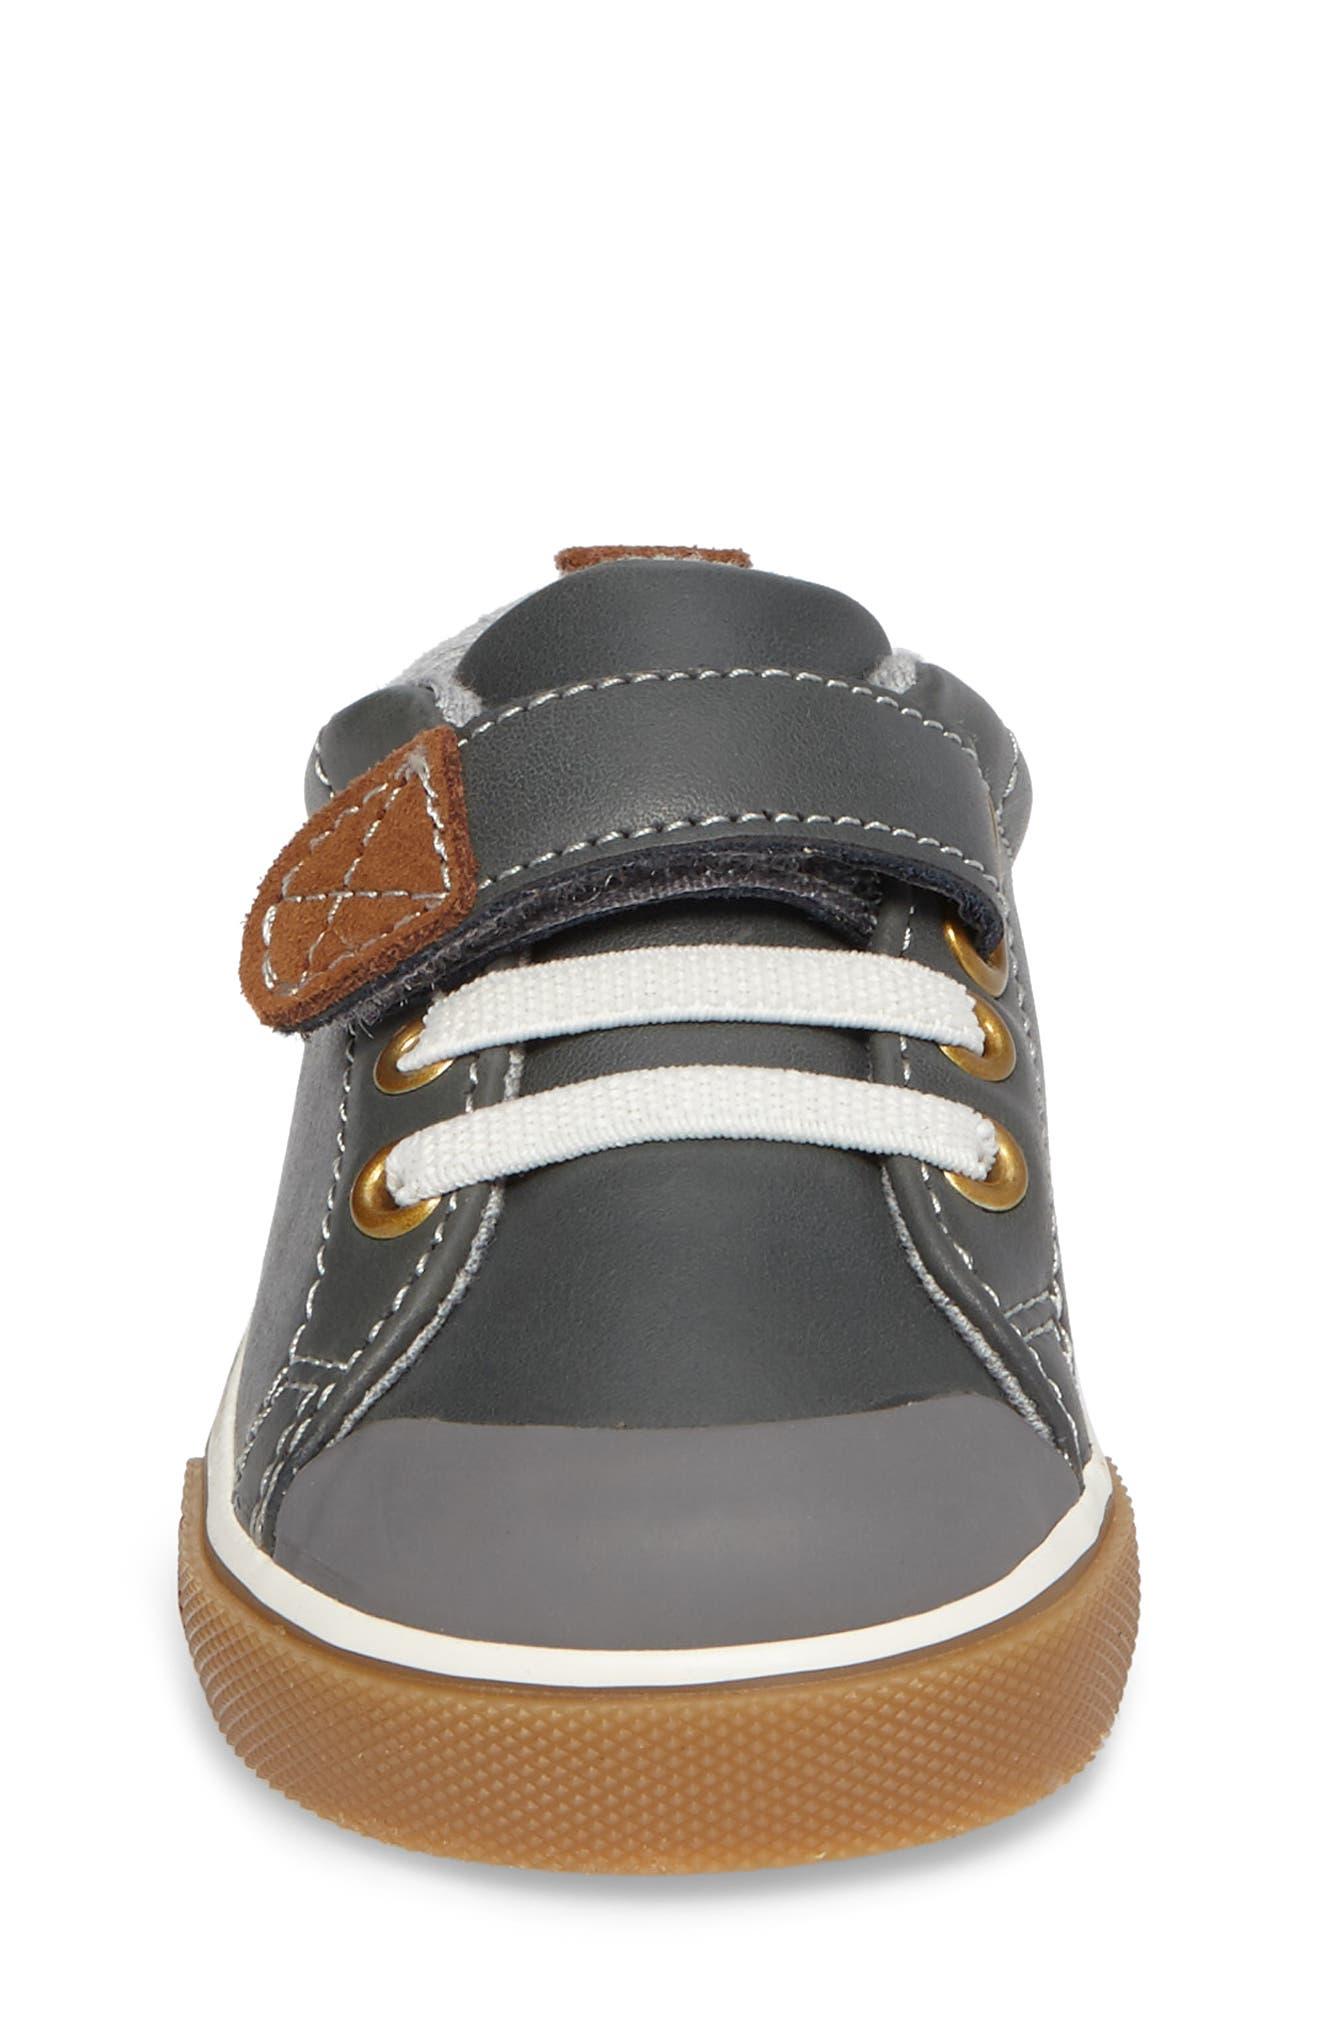 Stevie II Sneaker,                             Alternate thumbnail 4, color,                             GREY LEATHER